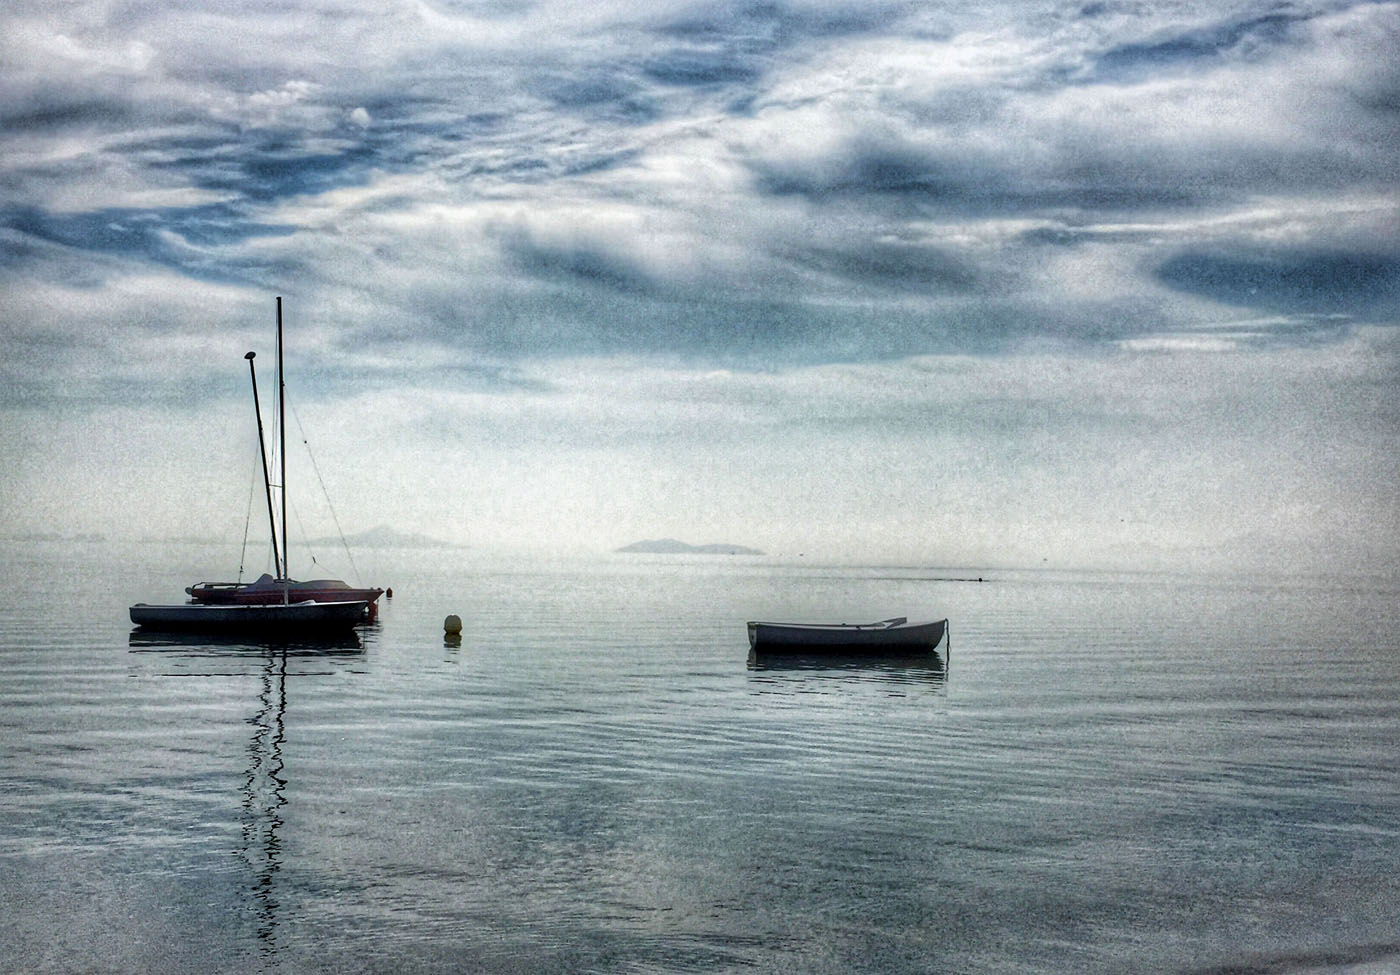 Boat-ifull